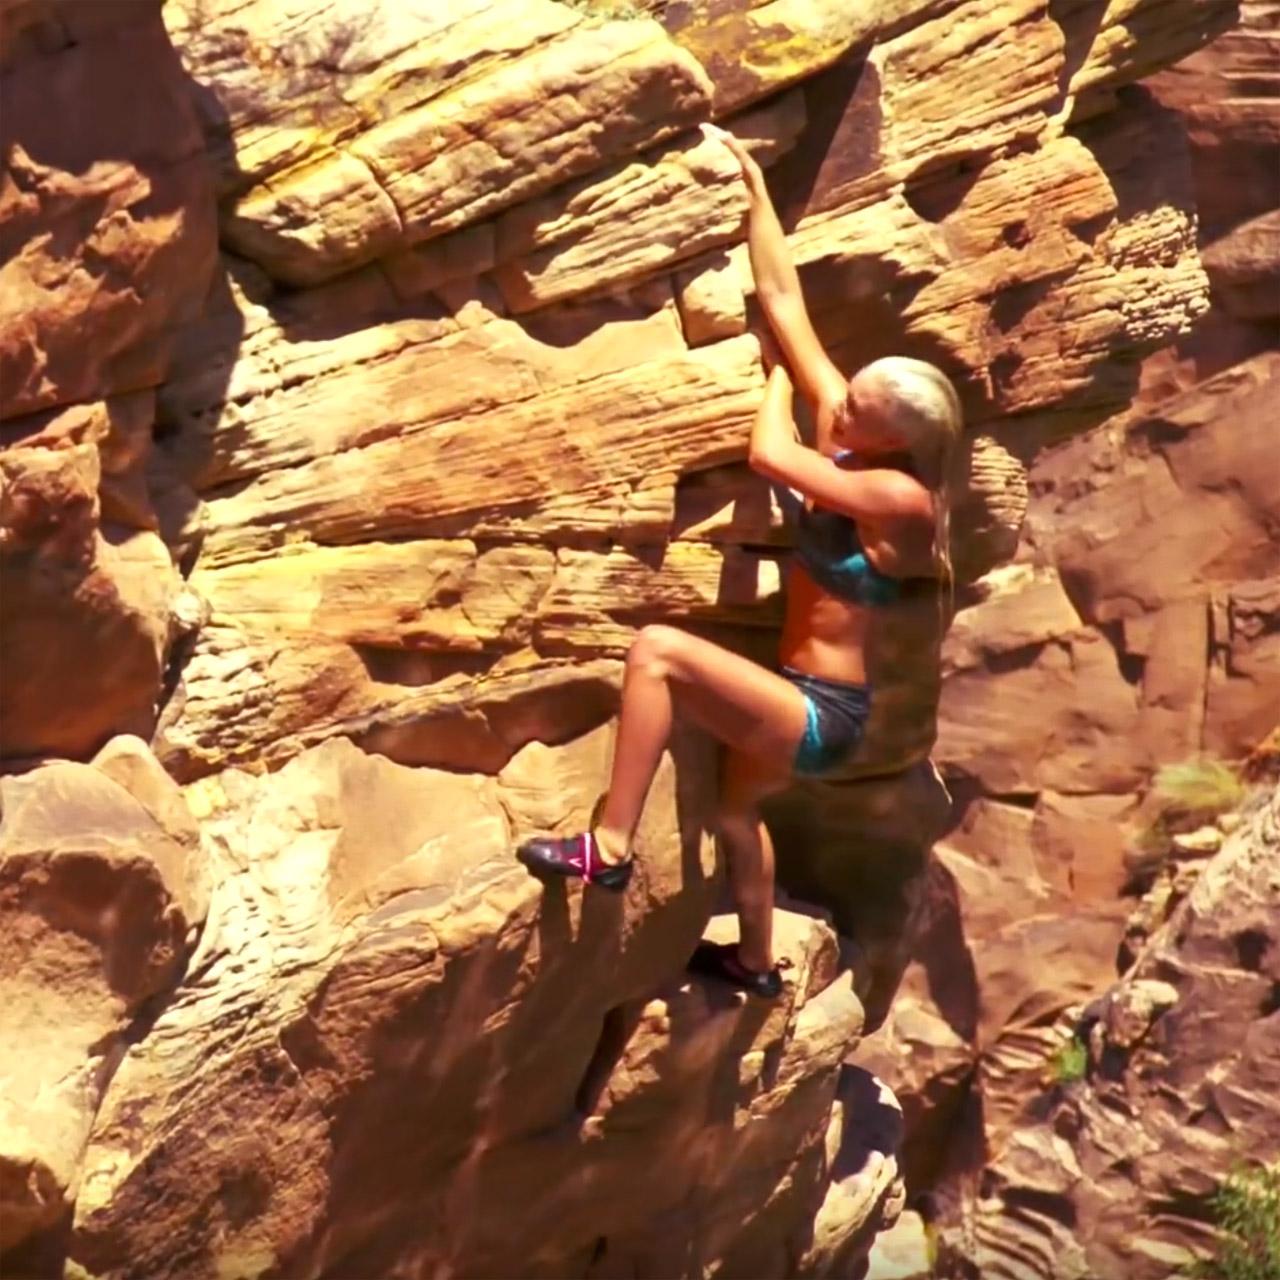 Sierra Blair-Coyle free climbing on riverside cliffs